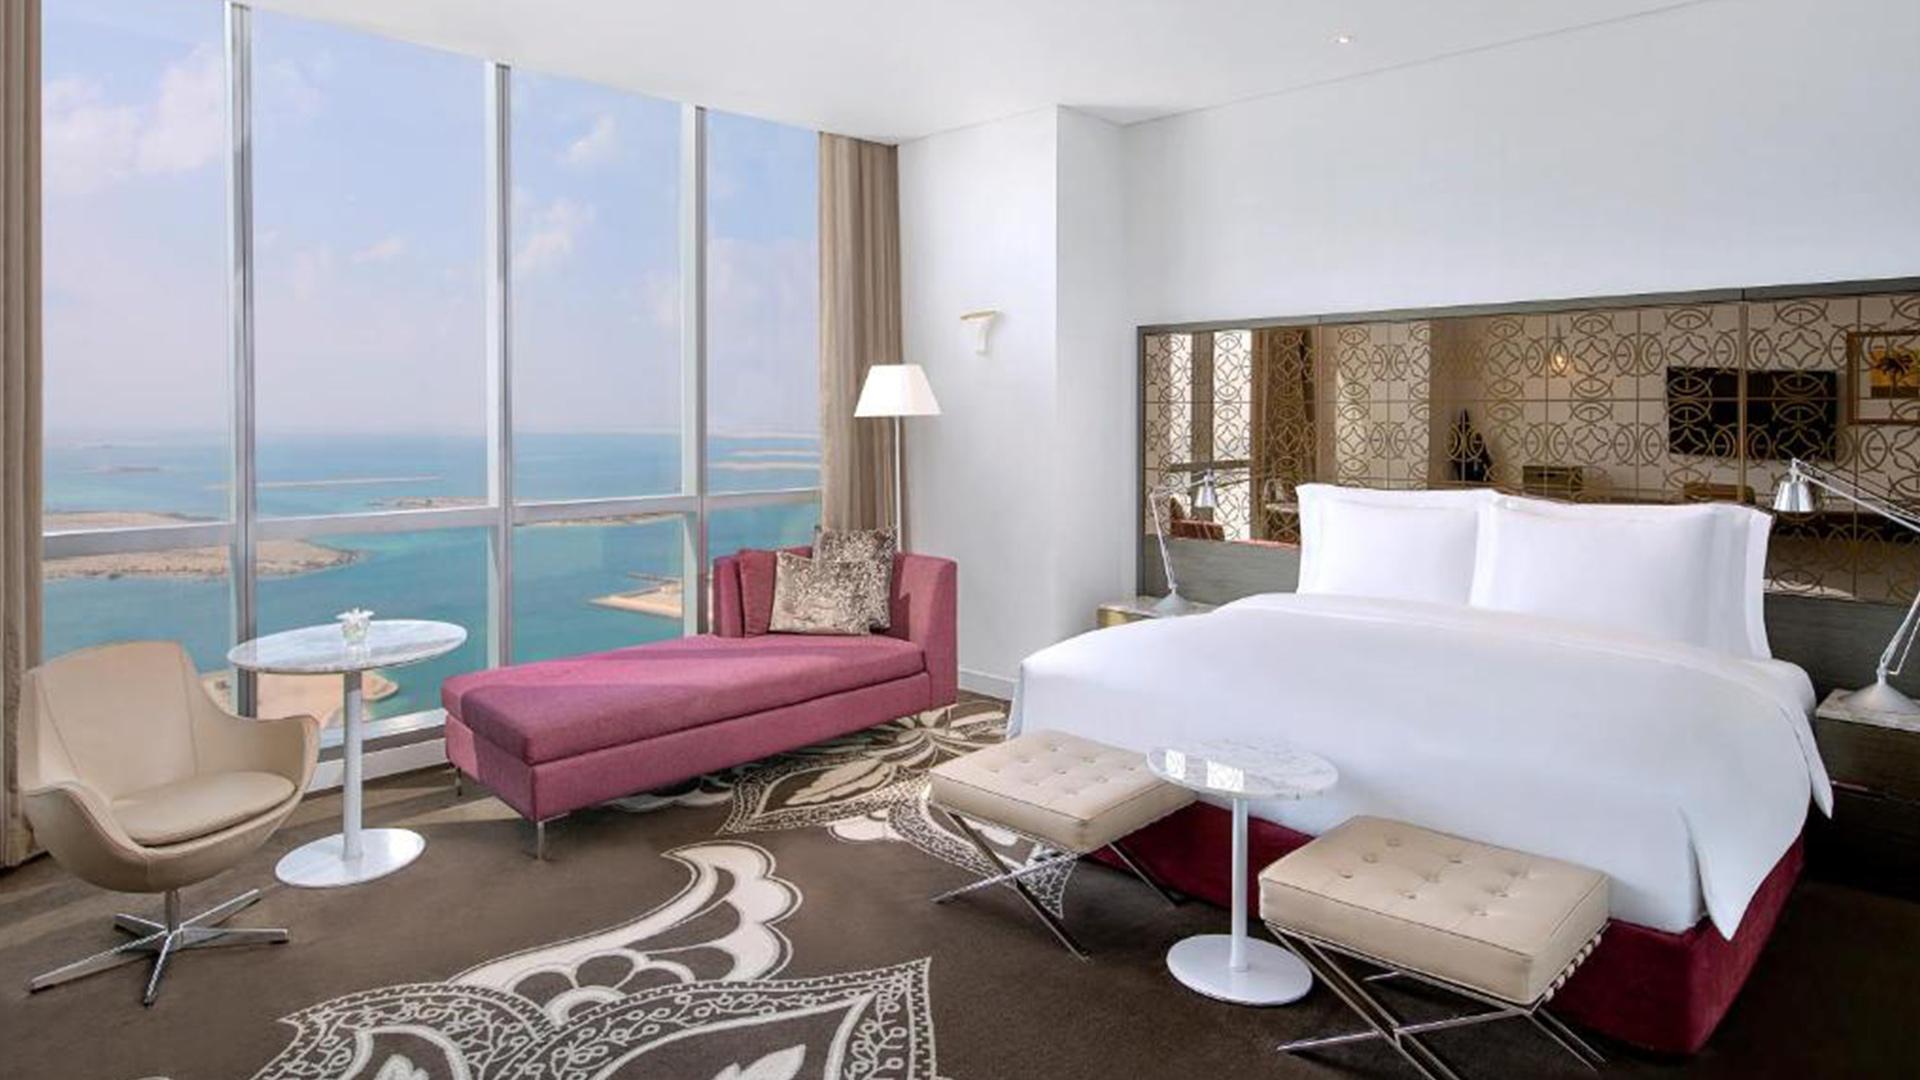 King Grand Premier Room with Sea View image 1 at Conrad Abu Dhabi Etihad Towers by null, Abu Dhabi, United Arab Emirates